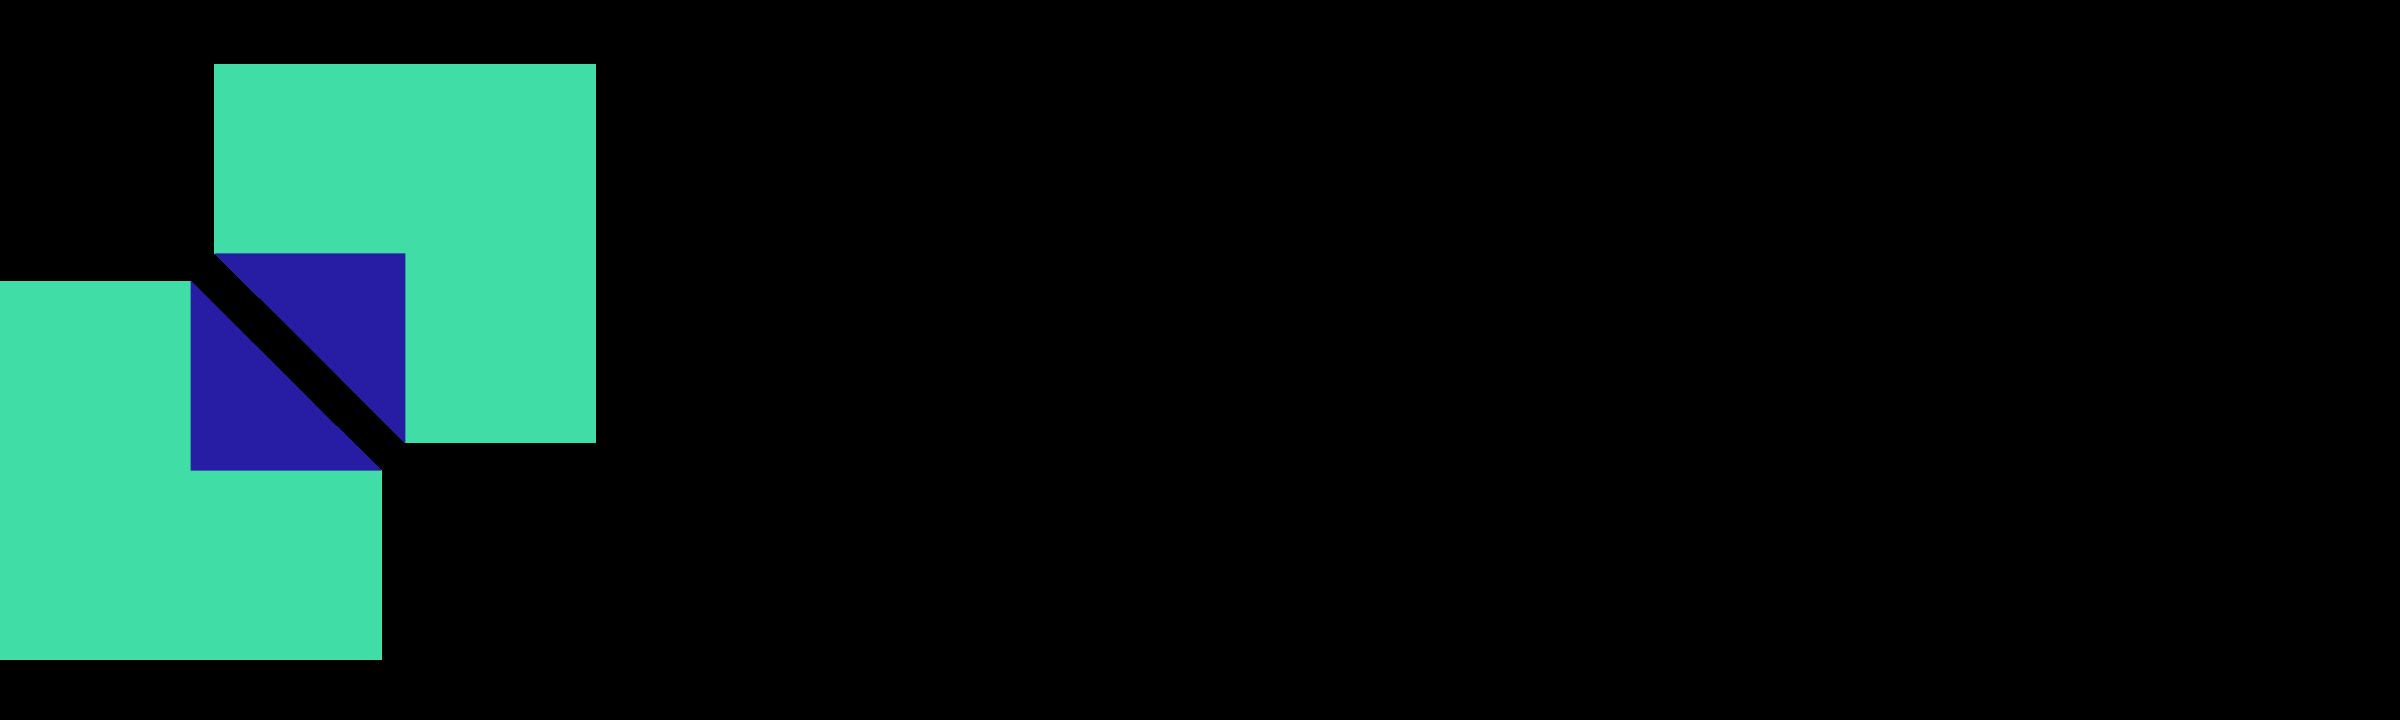 The onova logo